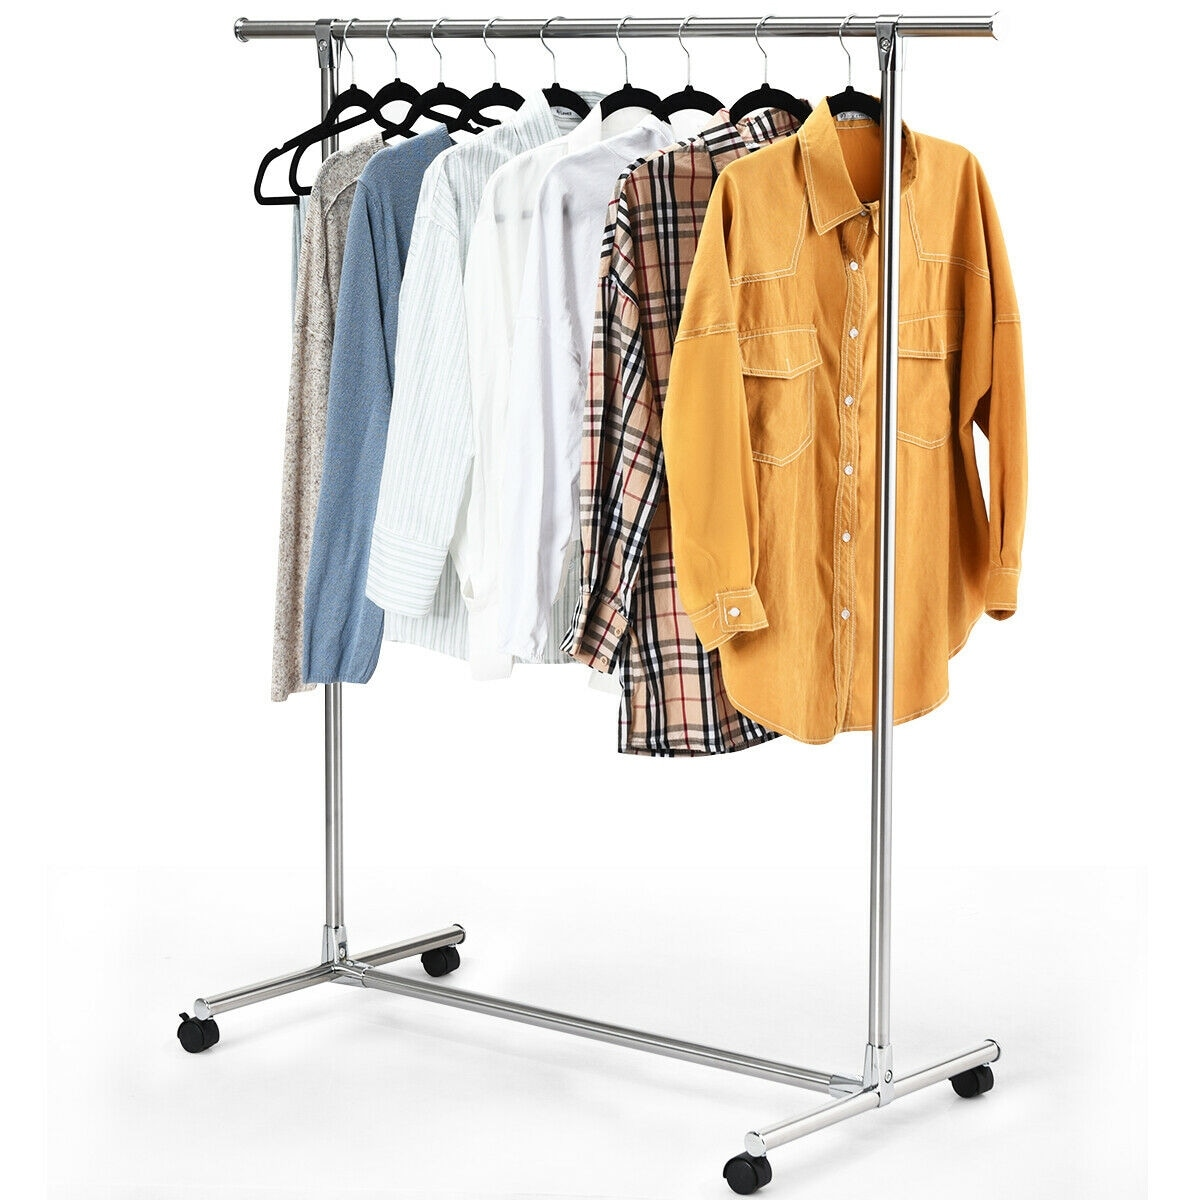 Gymax Garment Rack Clothing